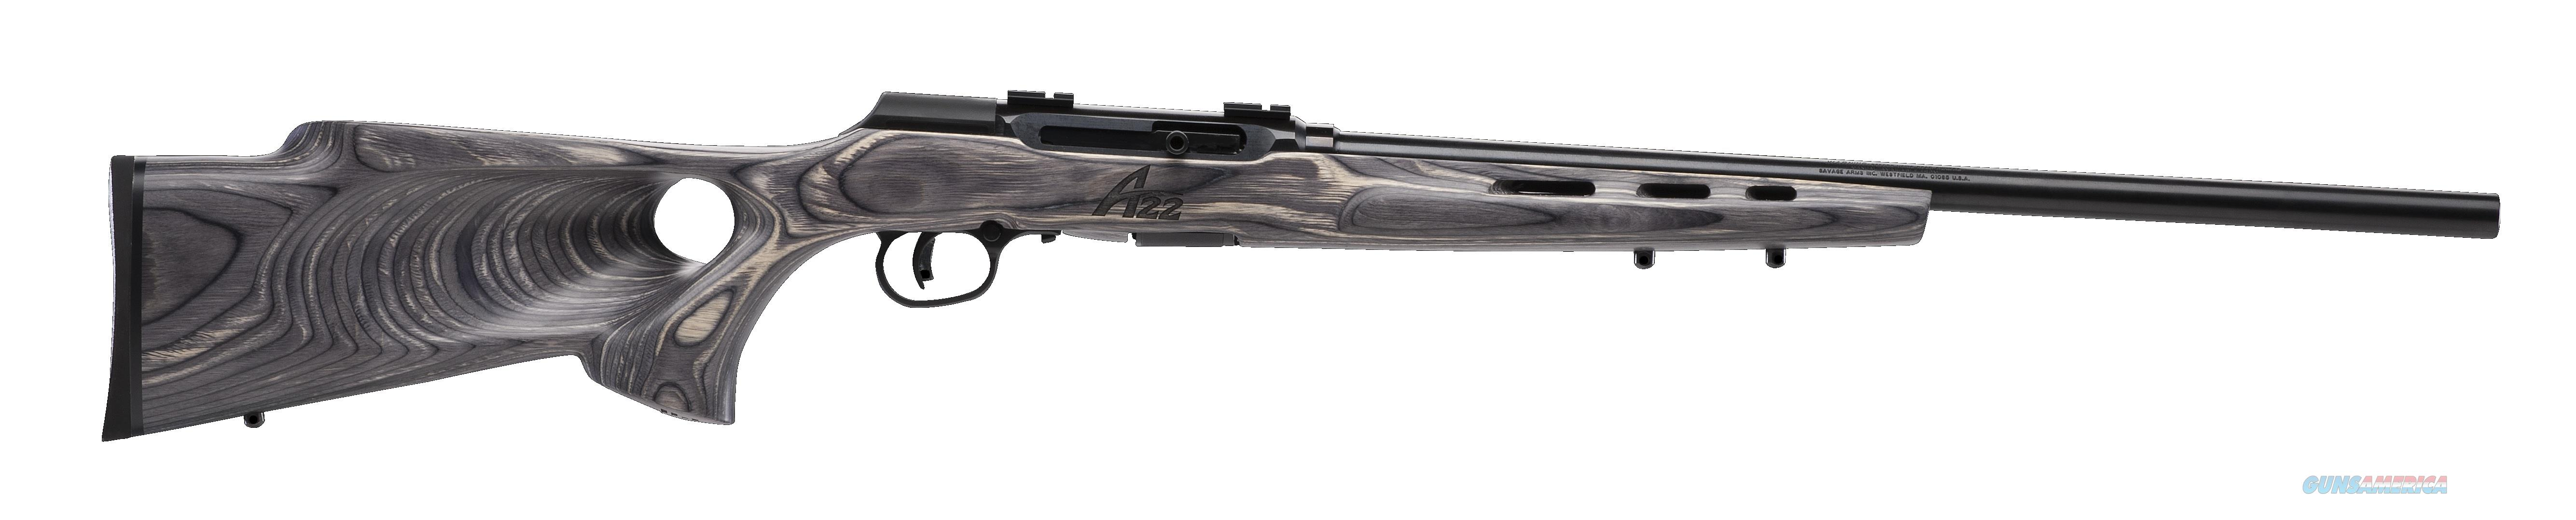 Savage Arms A22 Target 22Lr 22 Thumbhole 47215  Guns > Rifles > S Misc Rifles